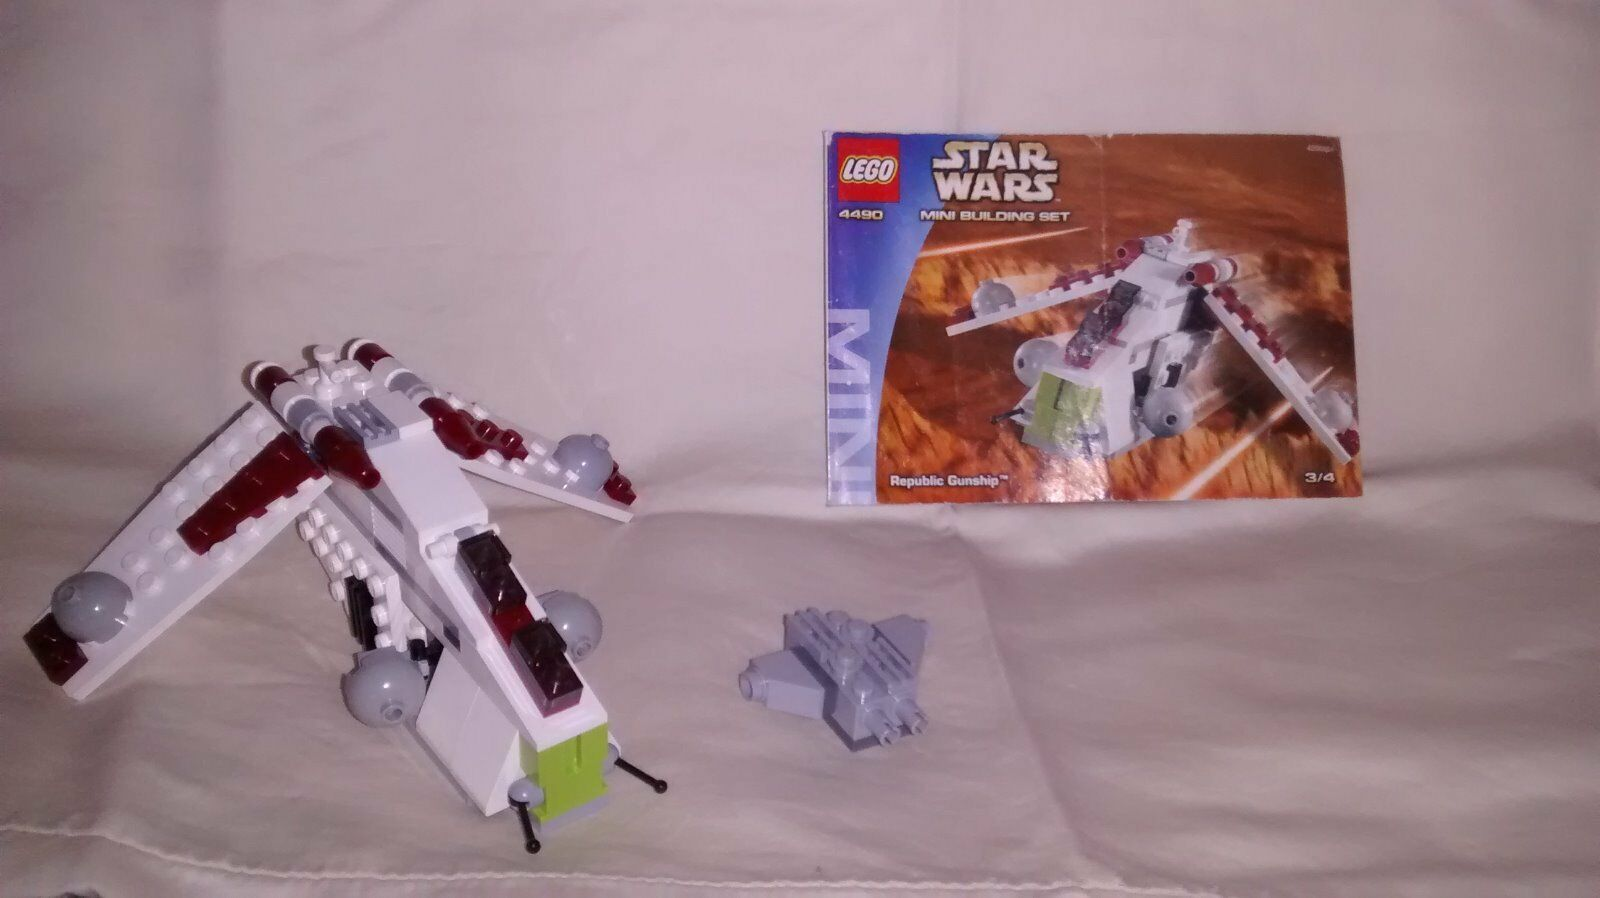 Lego Star Wars 4490 Mini Building SET Republic Republic Republic Gunship 100% Complete 85710e